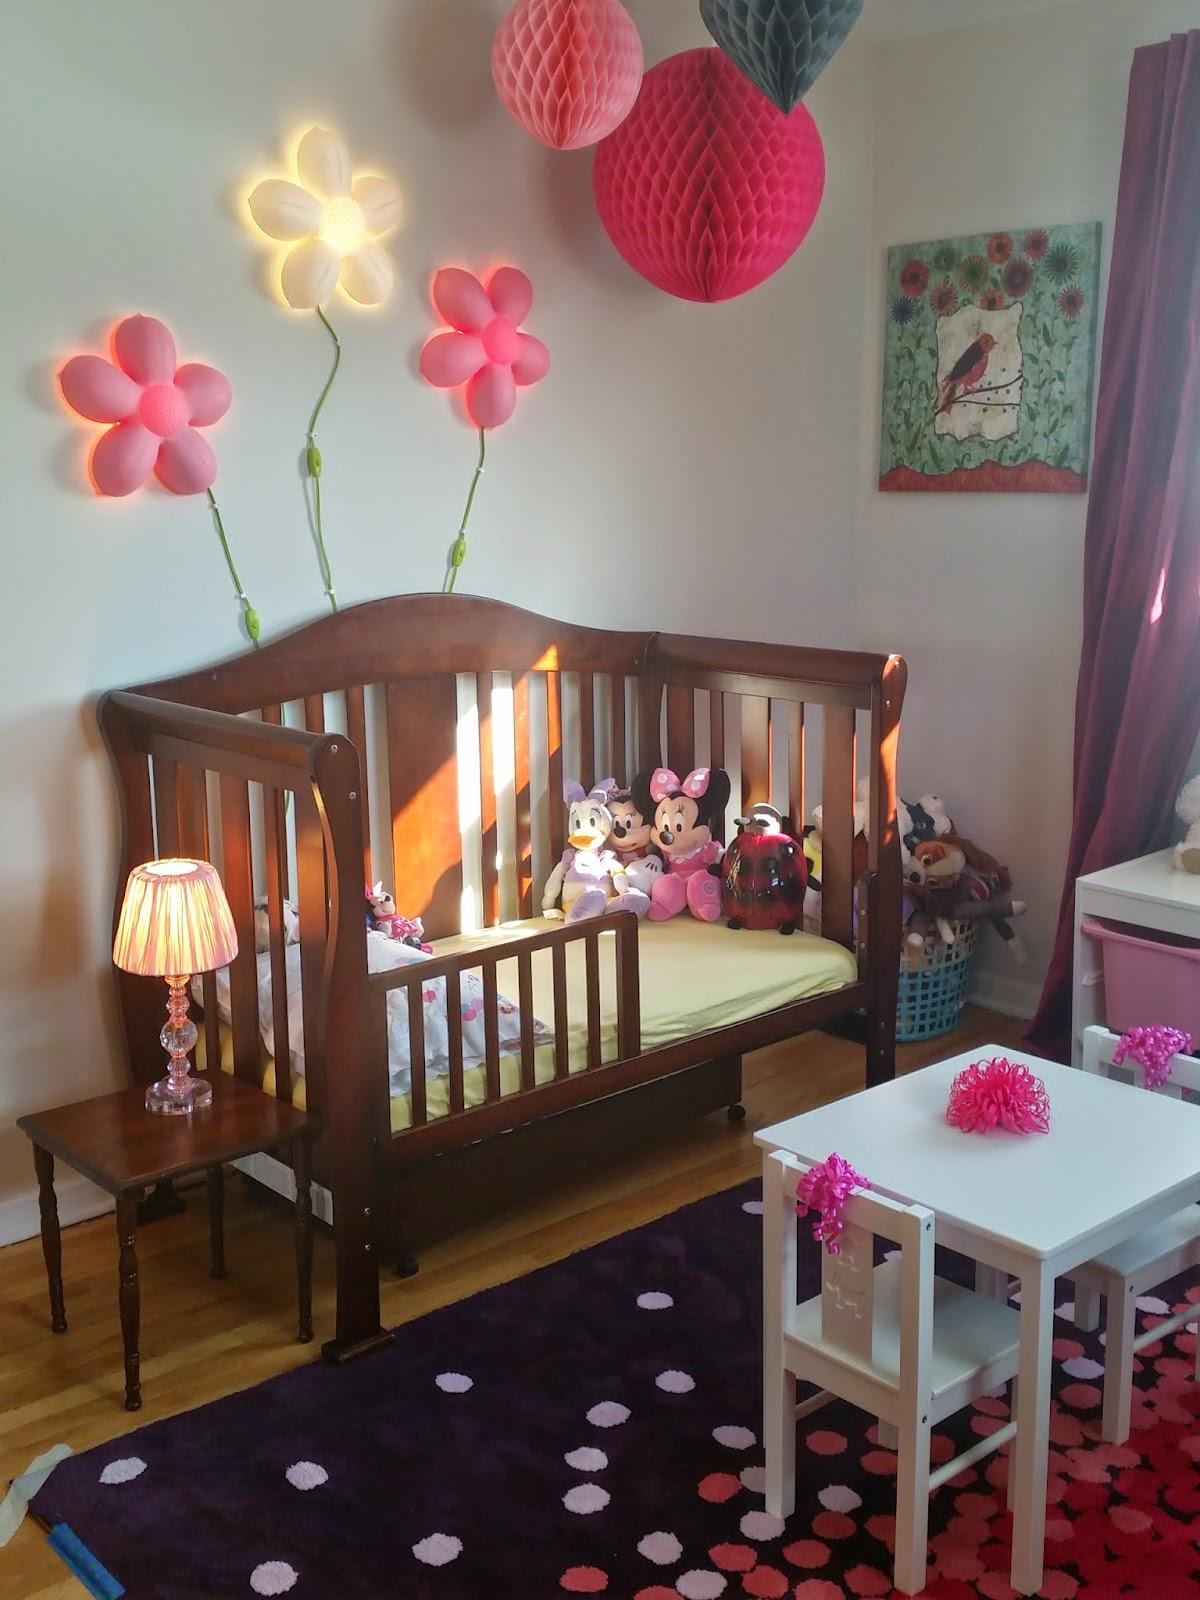 Ikea Smila Blomma Childrens Pink Flower Wall Light With Optional Light